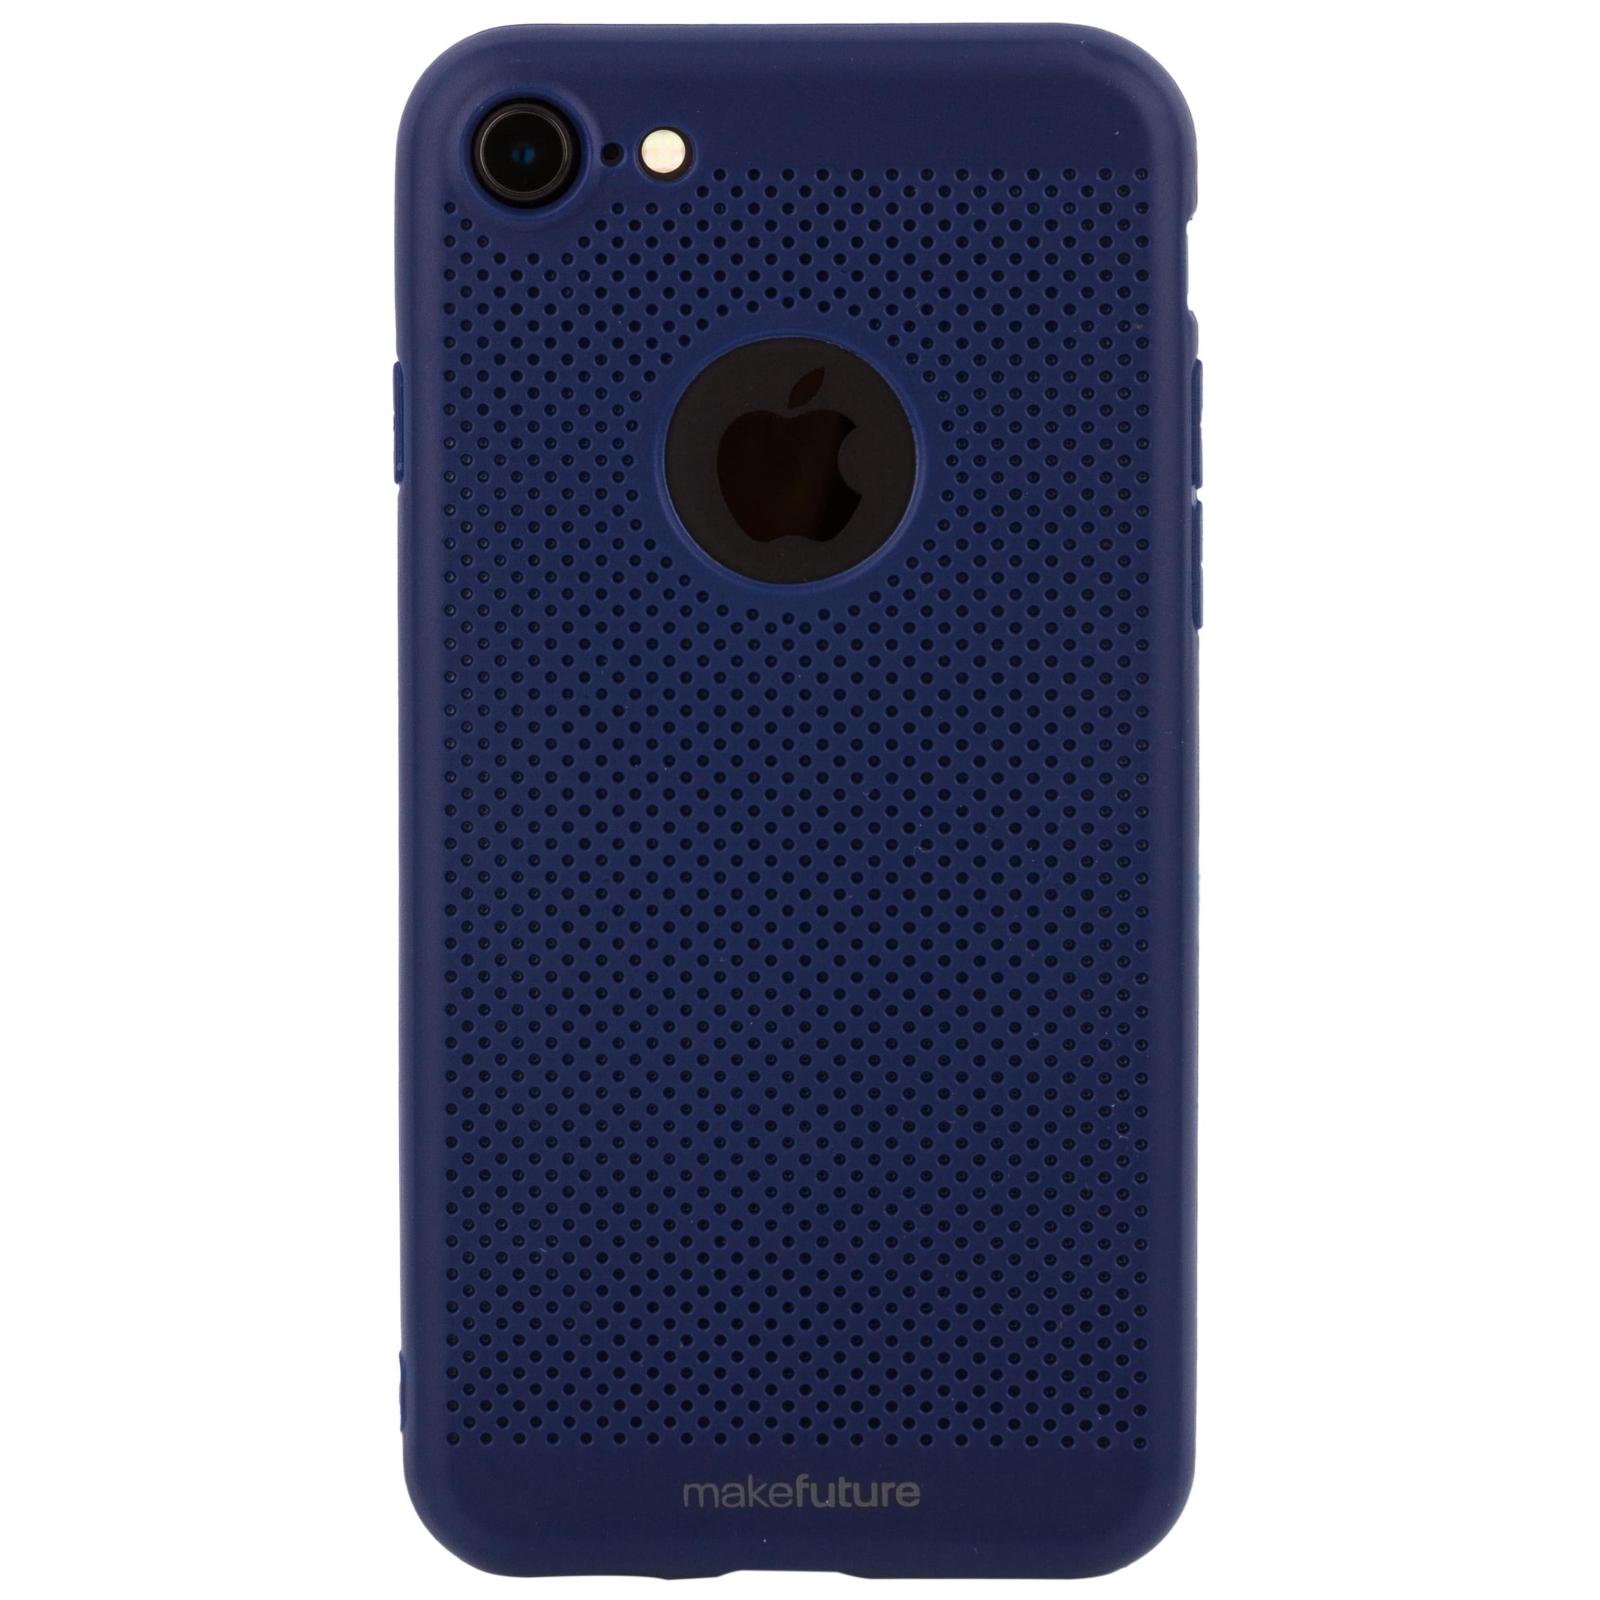 Чехол для моб. телефона MakeFuture Moon Case (TPU) для Apple iPhone 7 Blue (MCM-AI7BL)